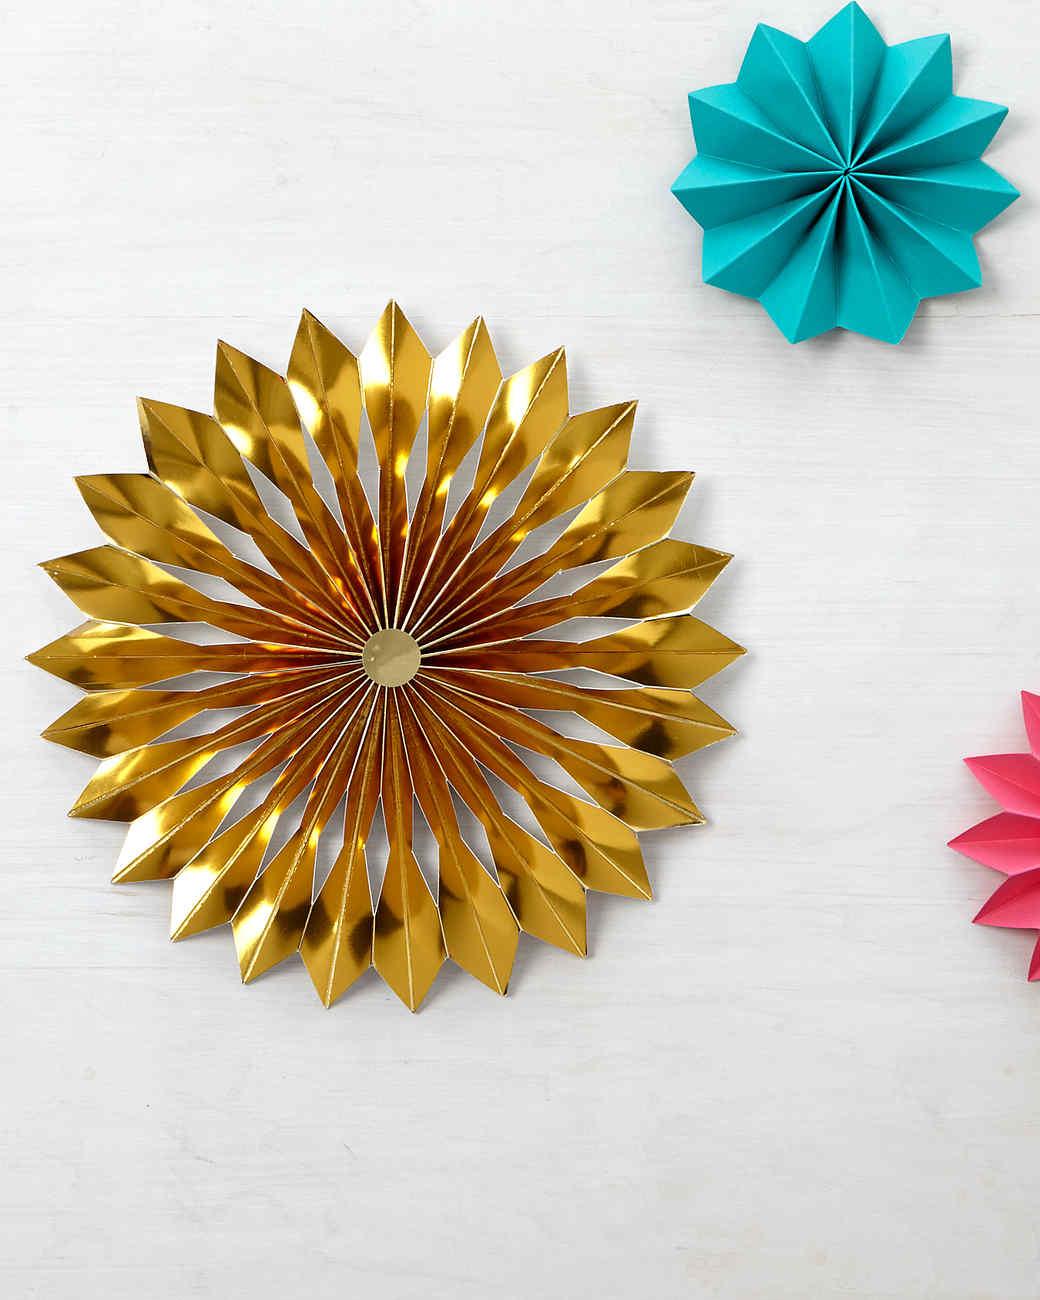 finalshot-crafts-rosettes-mrkt-1114.jpg